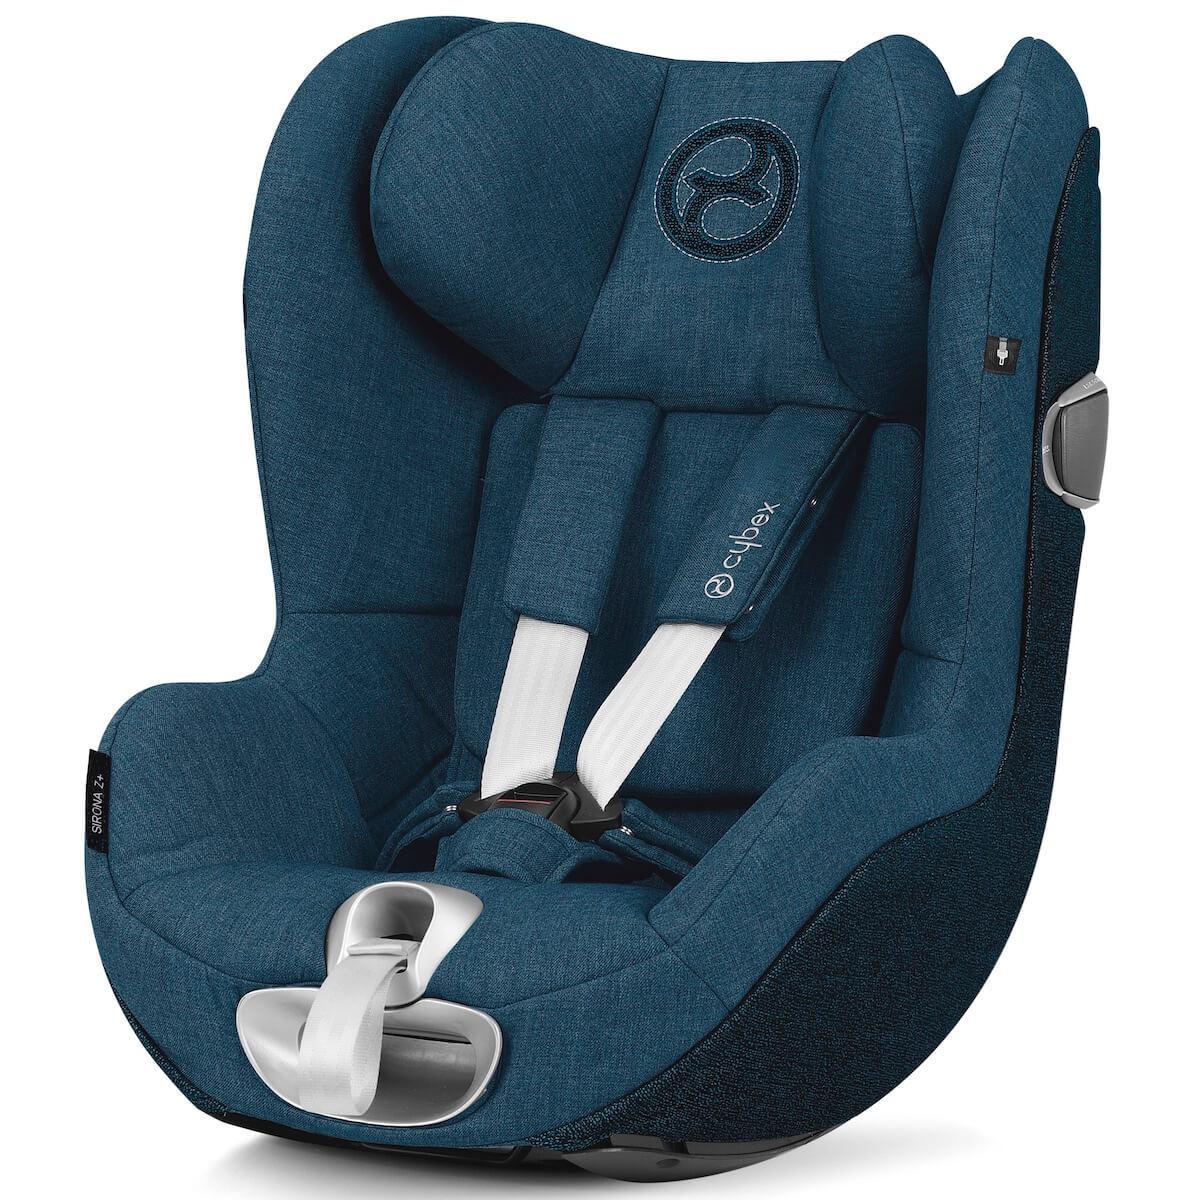 Siège auto gr0+/1 SIRONA Z I-SIZE PLUS Cybex Mountain blue-turquoise